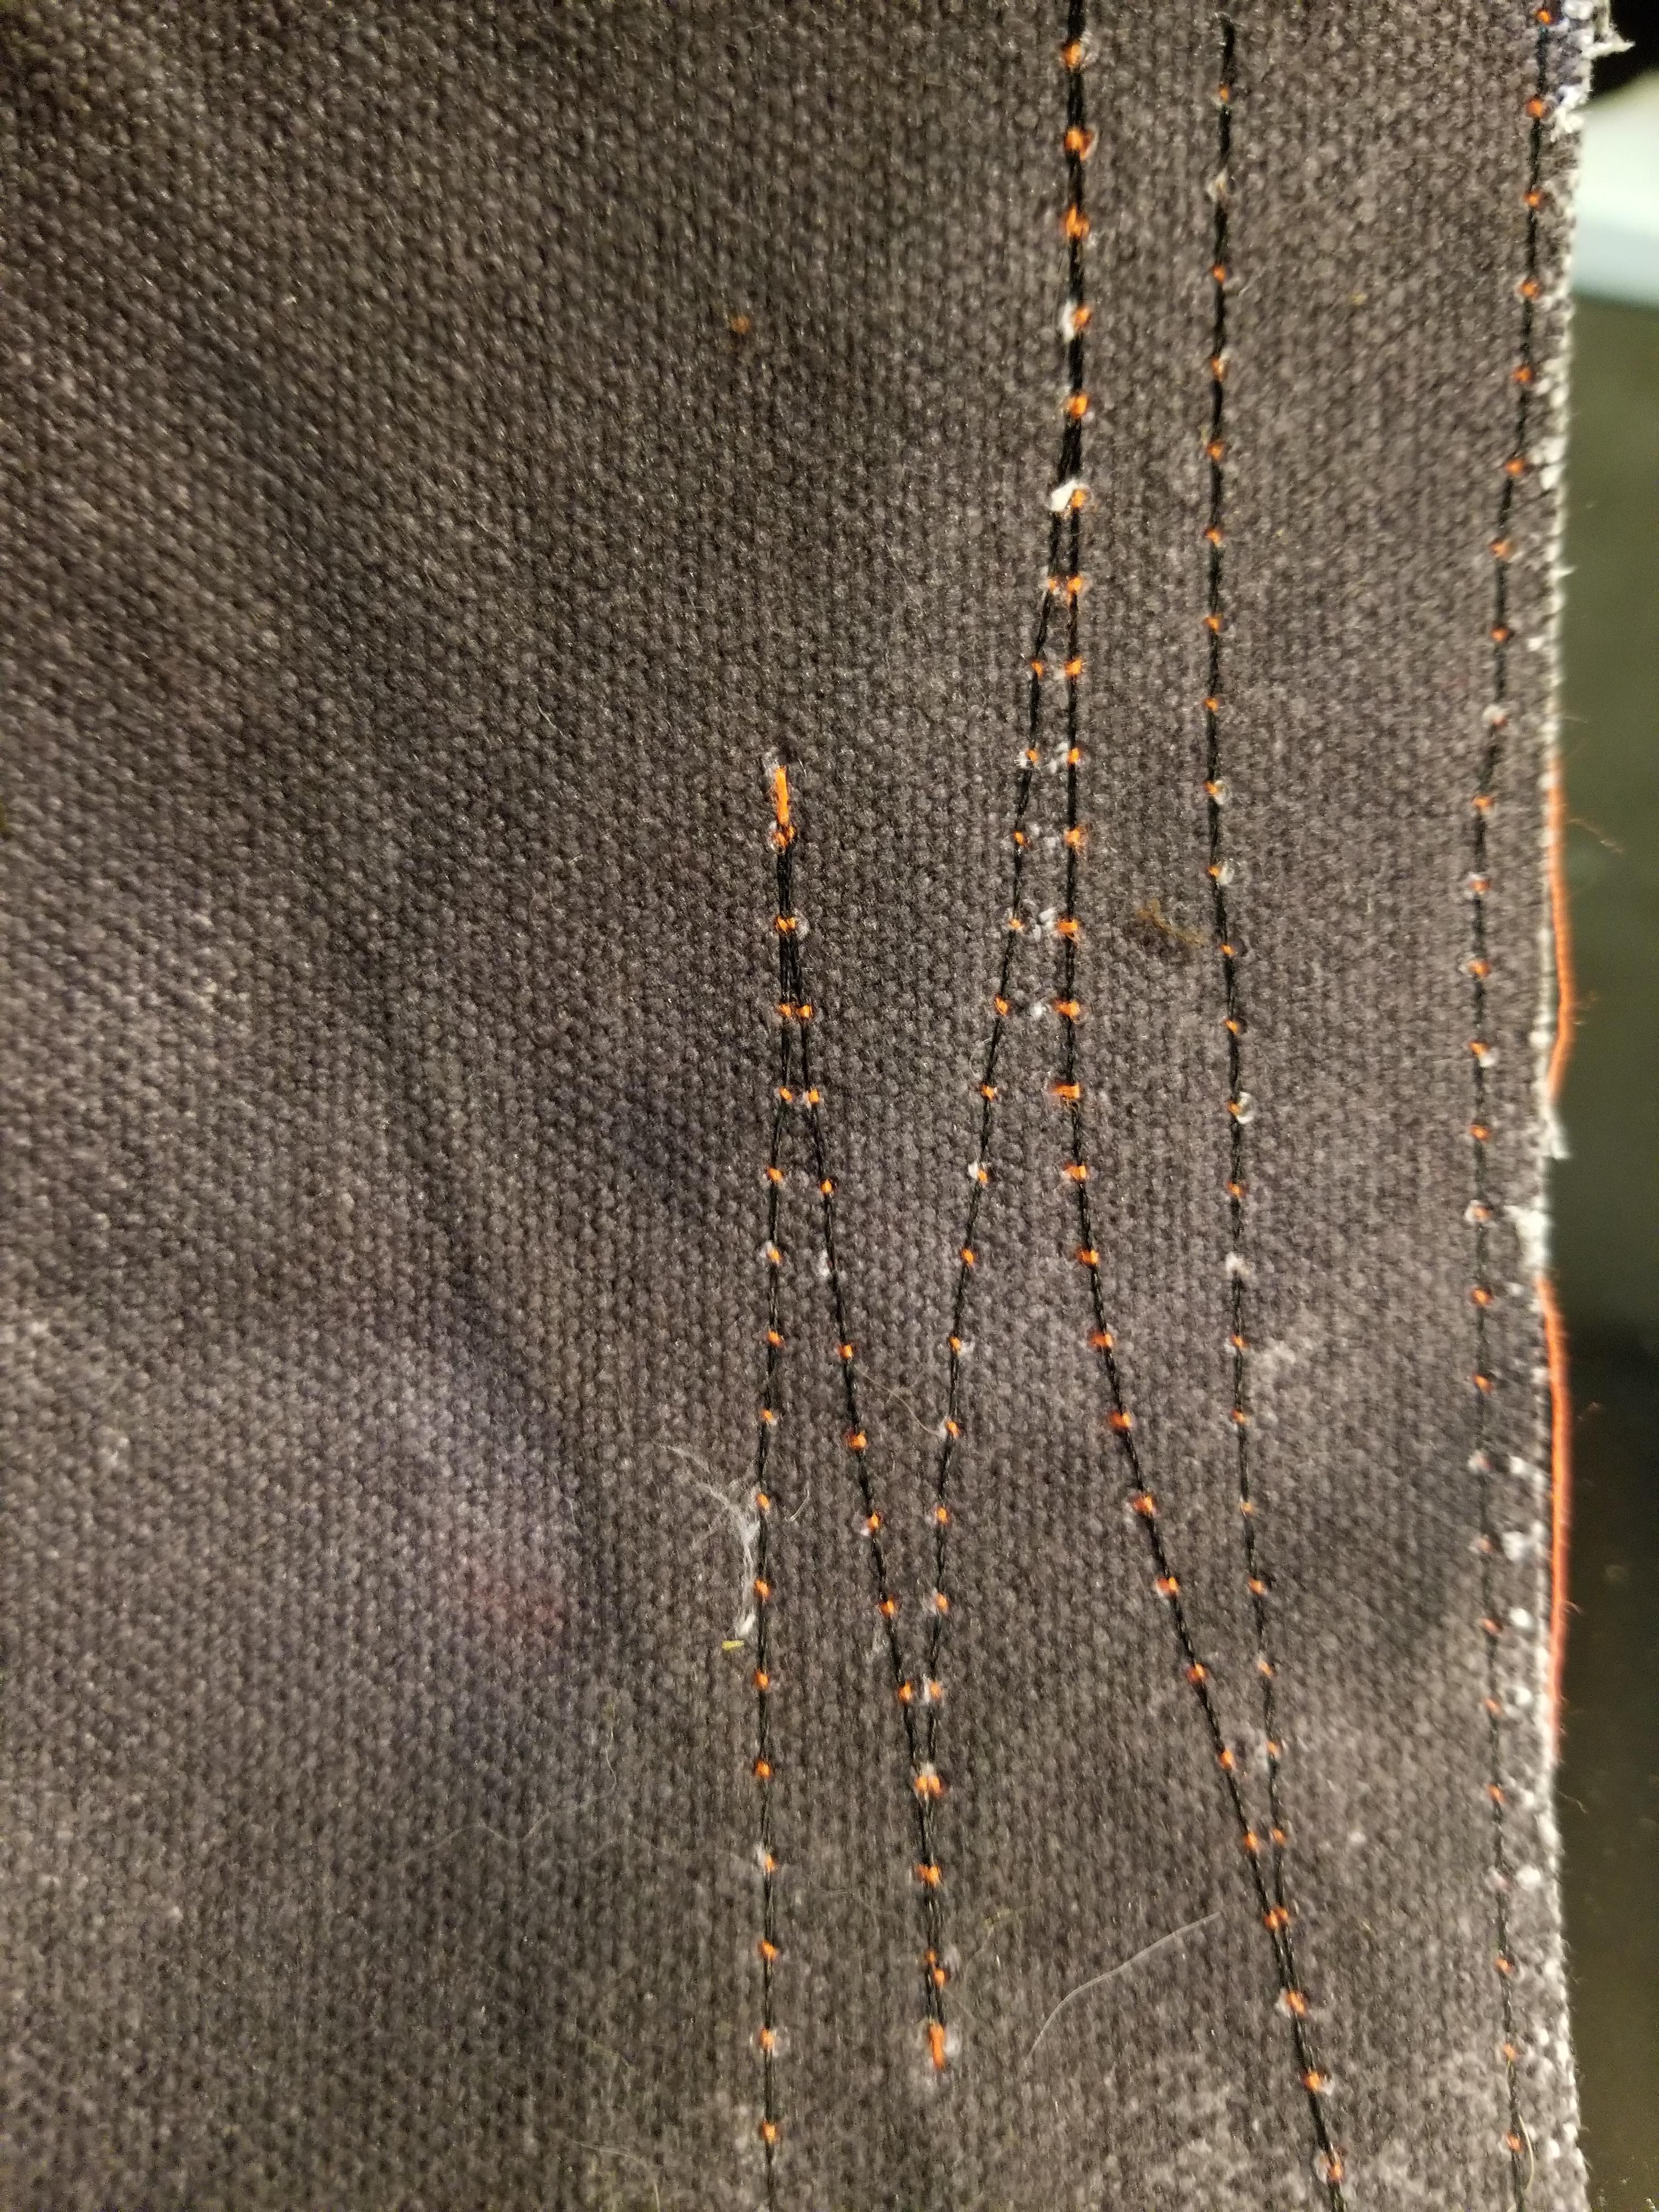 Bobbin Thread Loose : bobbin, thread, loose, Seeing, Bobbin, Thread, Through, Top..,, Tention, Loose?, Combination